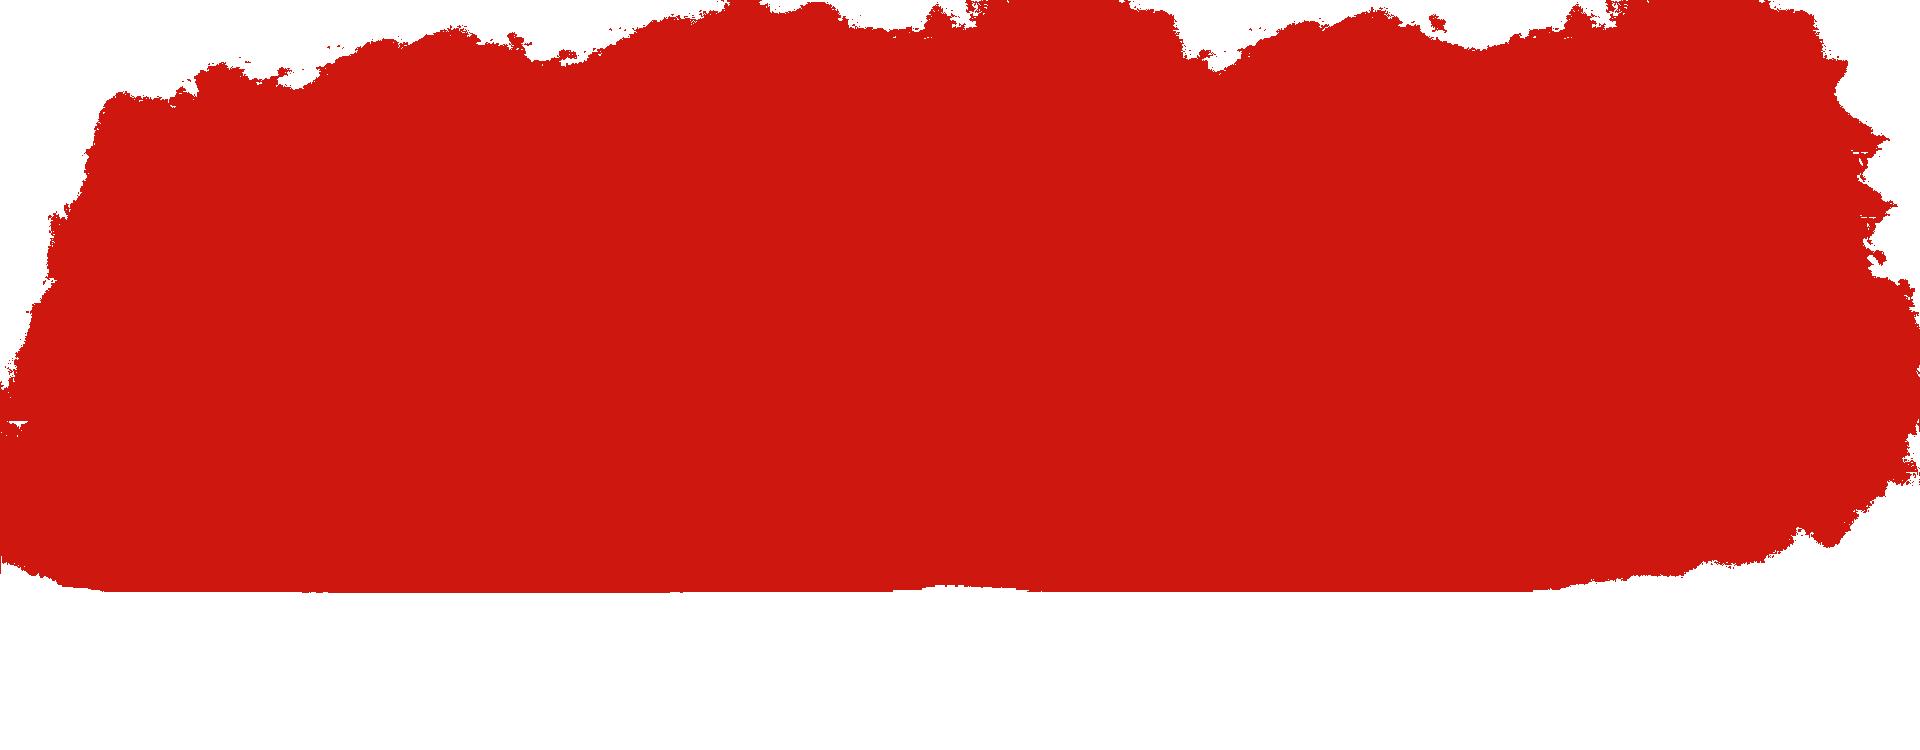 AGON_AGM700_FV_FW_RGB_BACKGROUND.png